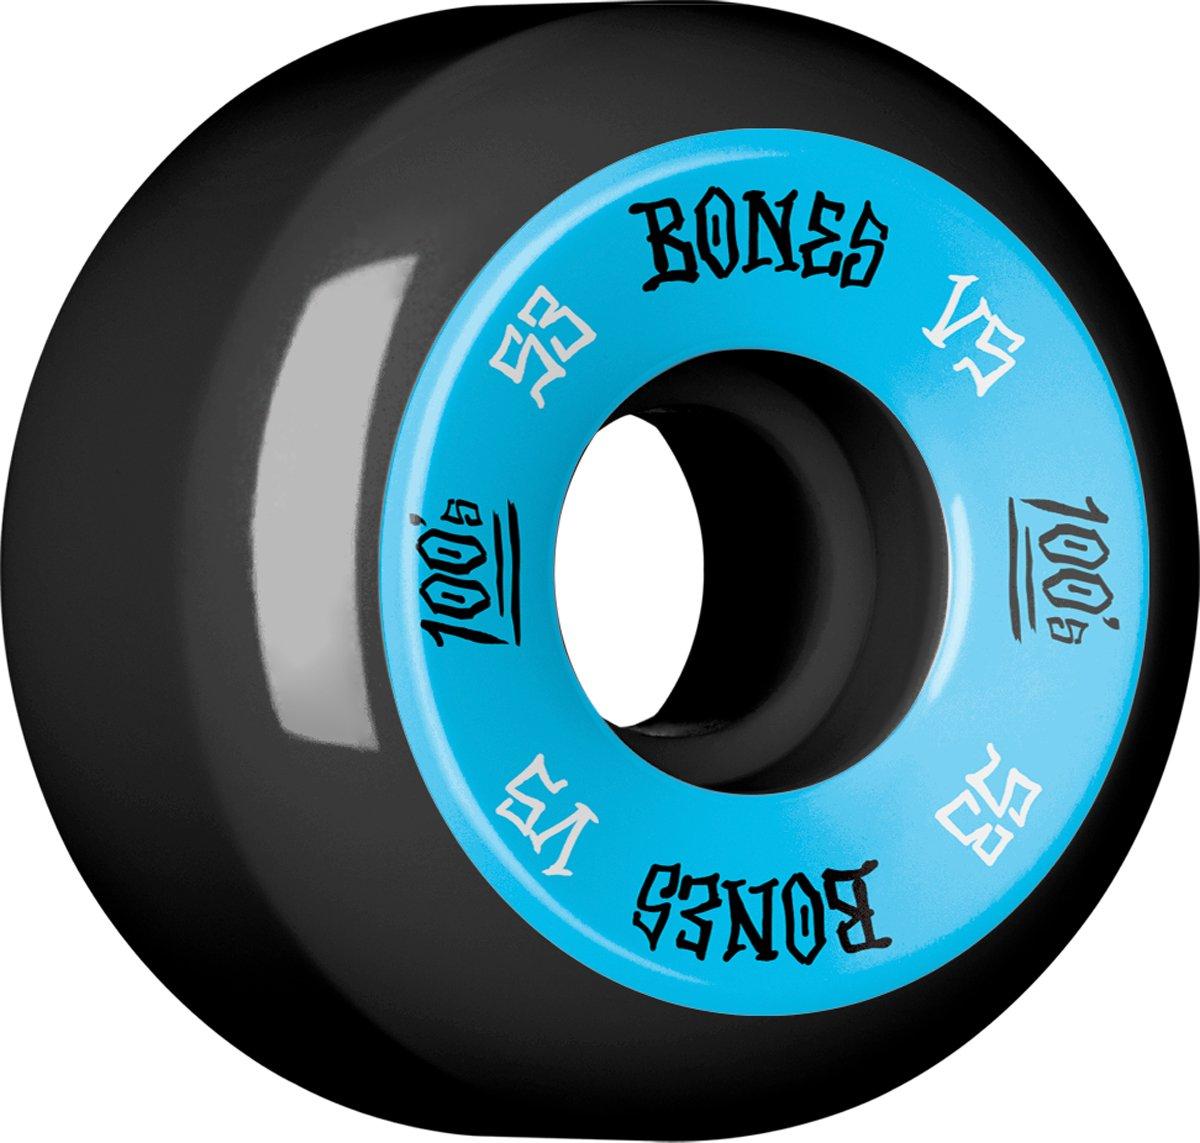 Bones Wheels 100'S # 1 53x34 Negro [V5] (Nuevo)